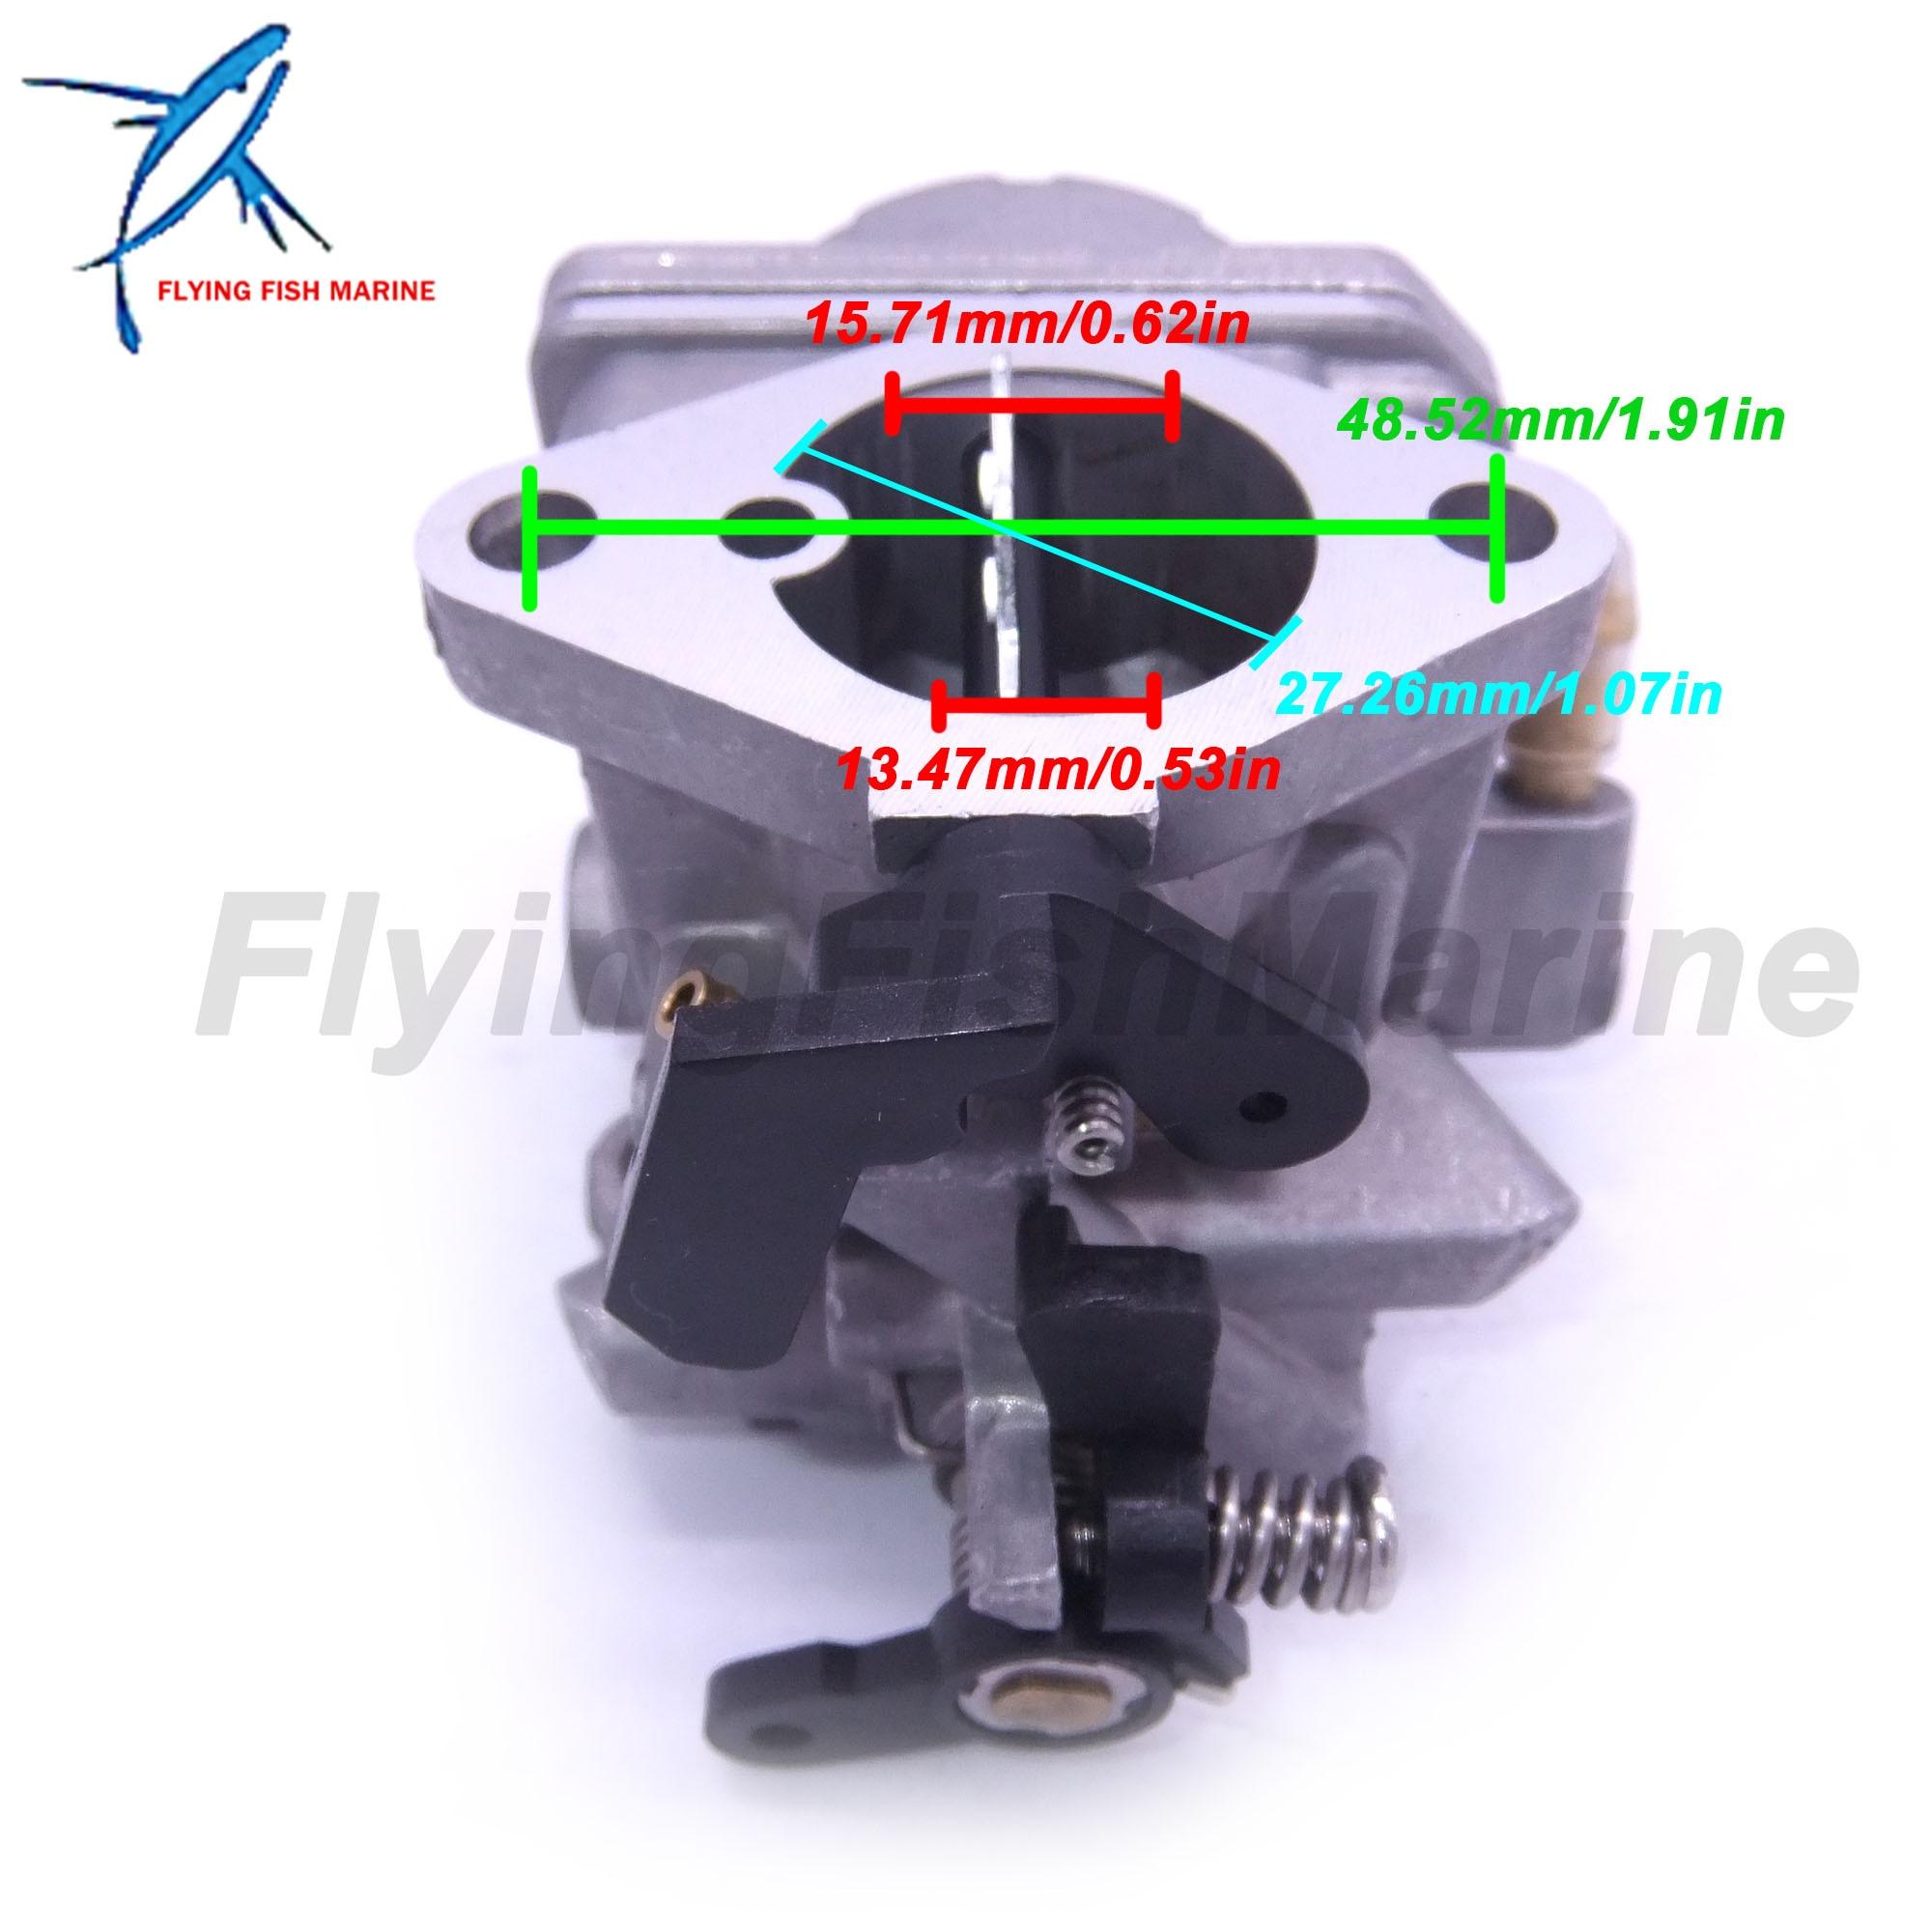 Image 4 - 3JE 03200 0 3JE032000 3JE032000M Outboard Motor Carburetor Assy  for Tohatsu Nissan 4 stroke 6HP MFS6C NFS6C Boat EngineBoat Engine   -